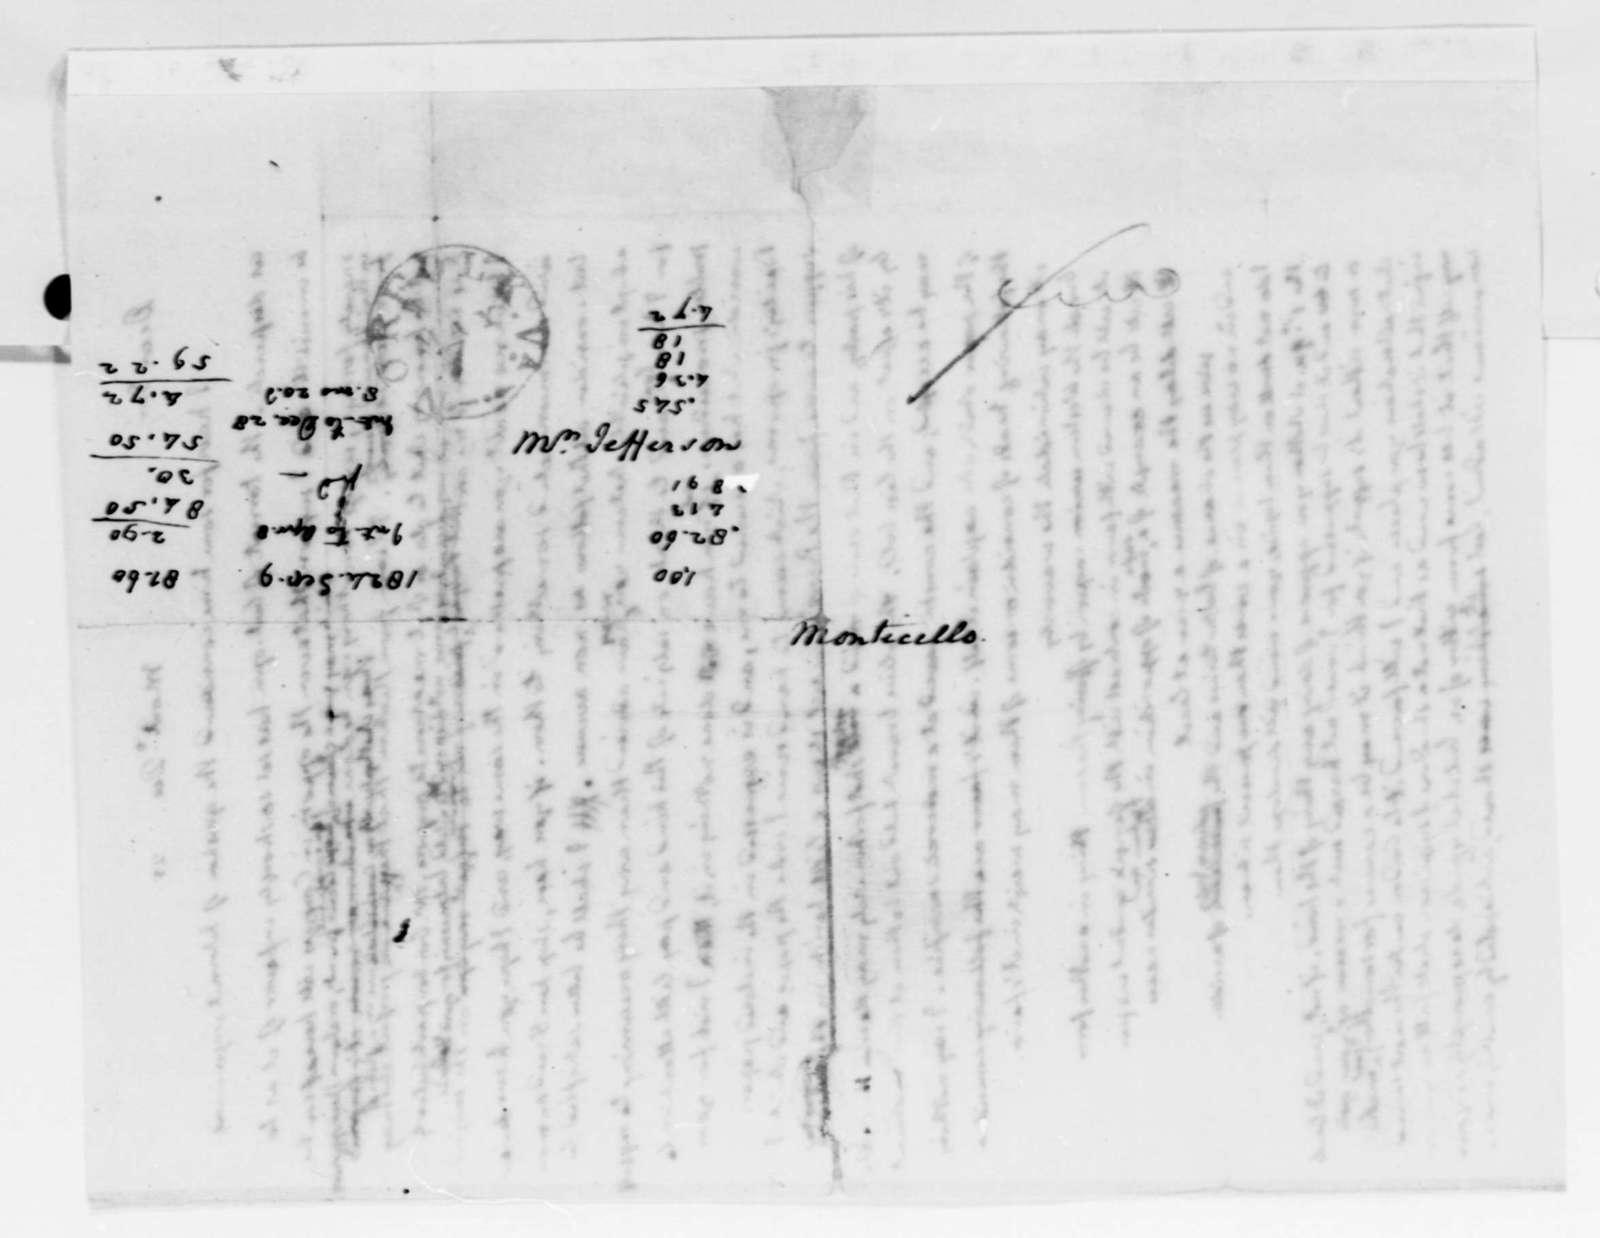 Thomas Jefferson to James Madison, December 24, 1825, with Draft